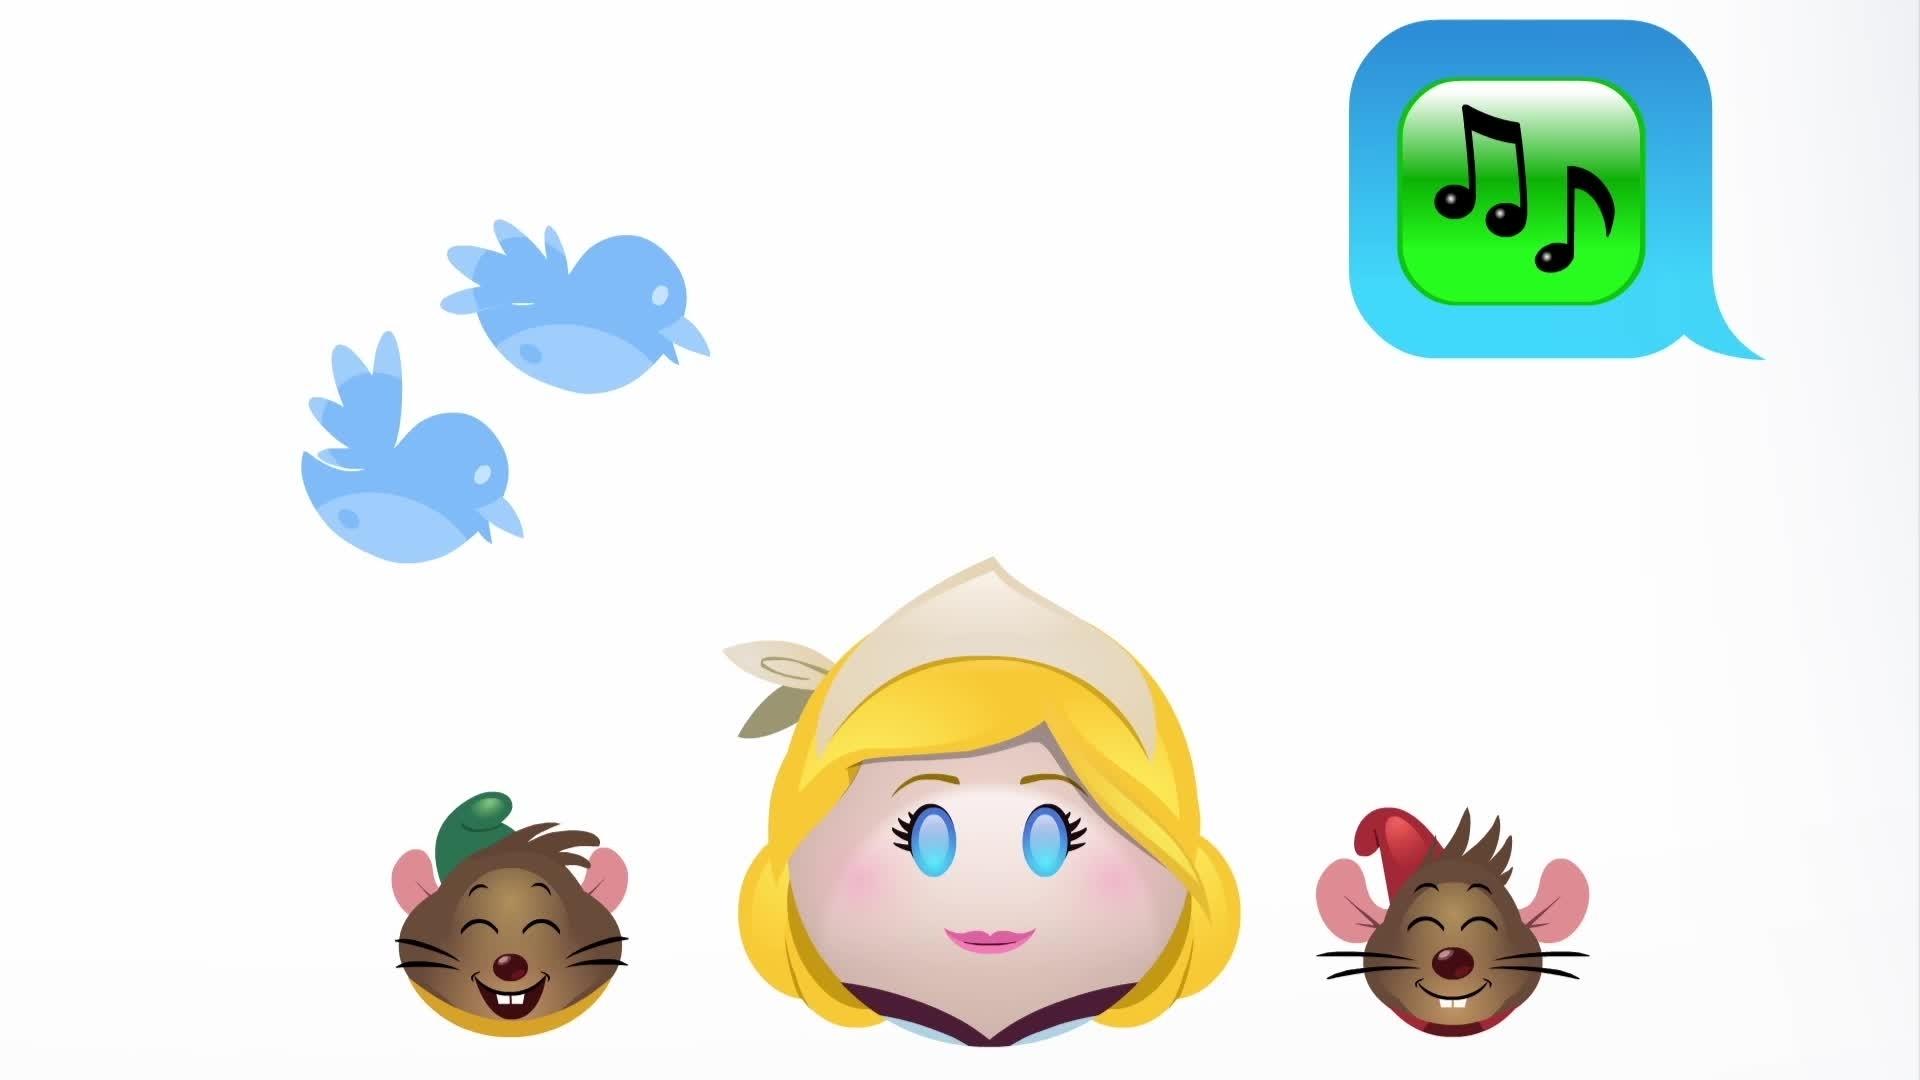 Disney Emojis - Cendrillon